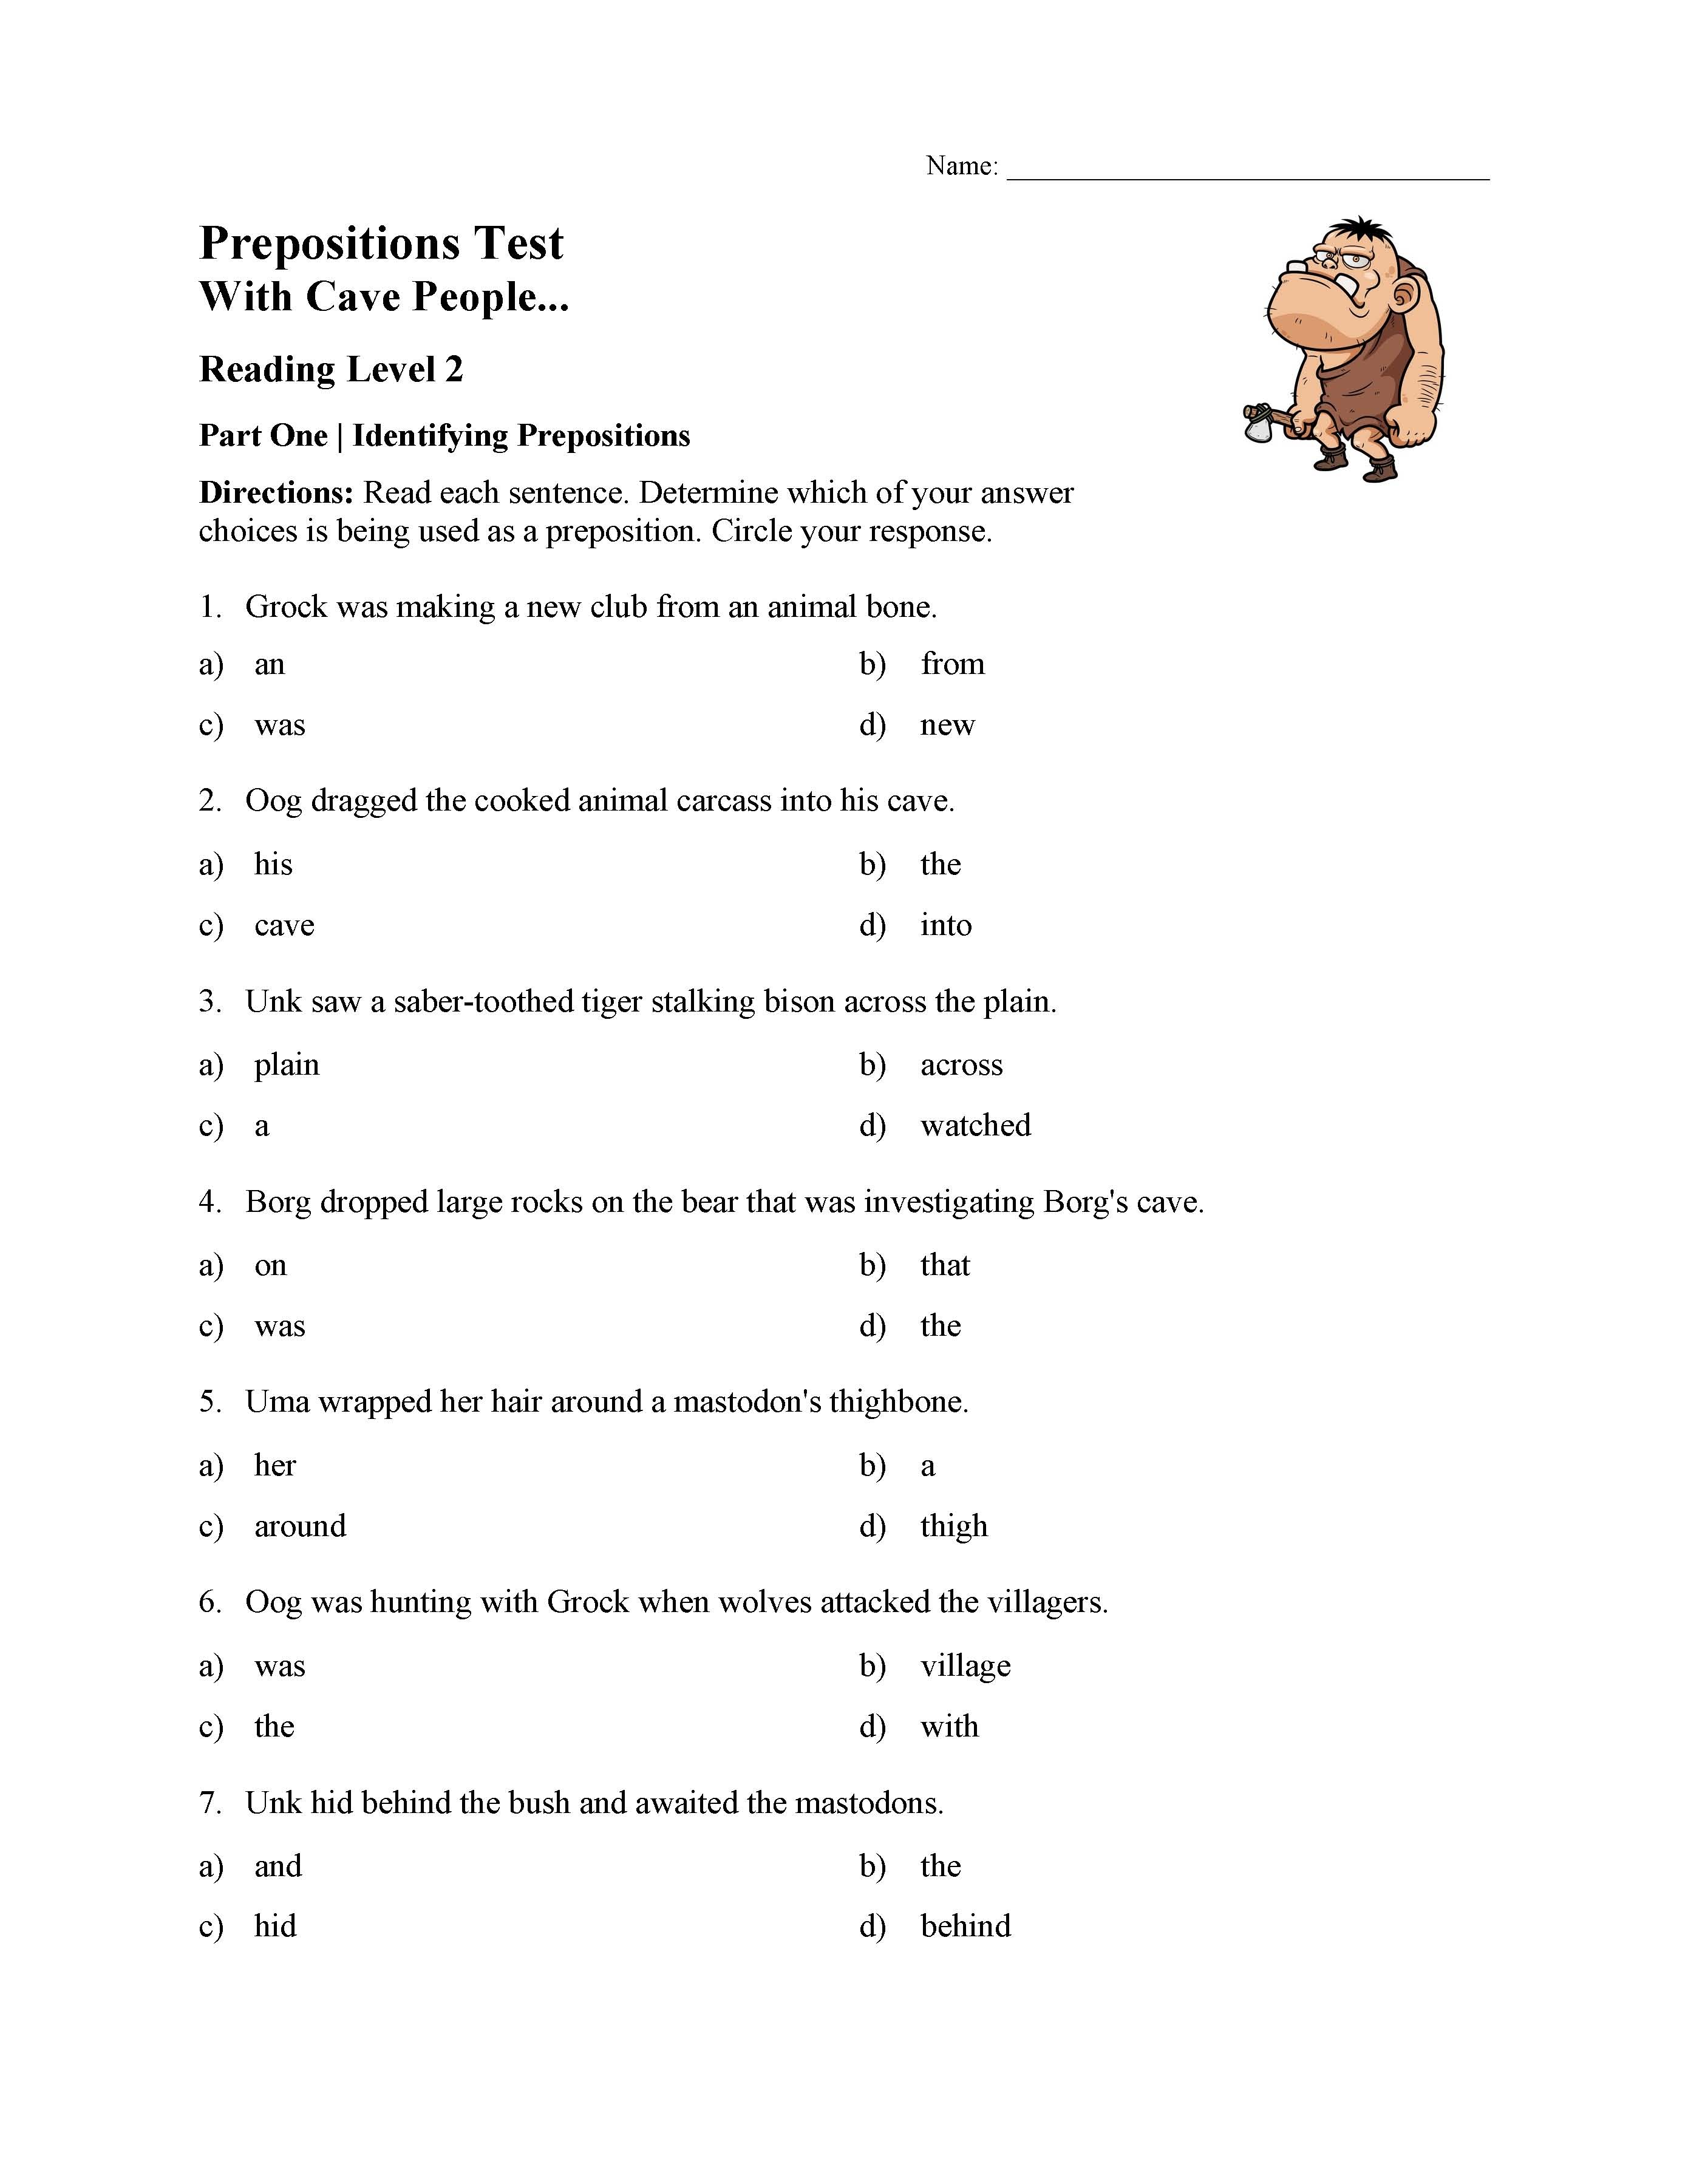 Prepositions Test 1